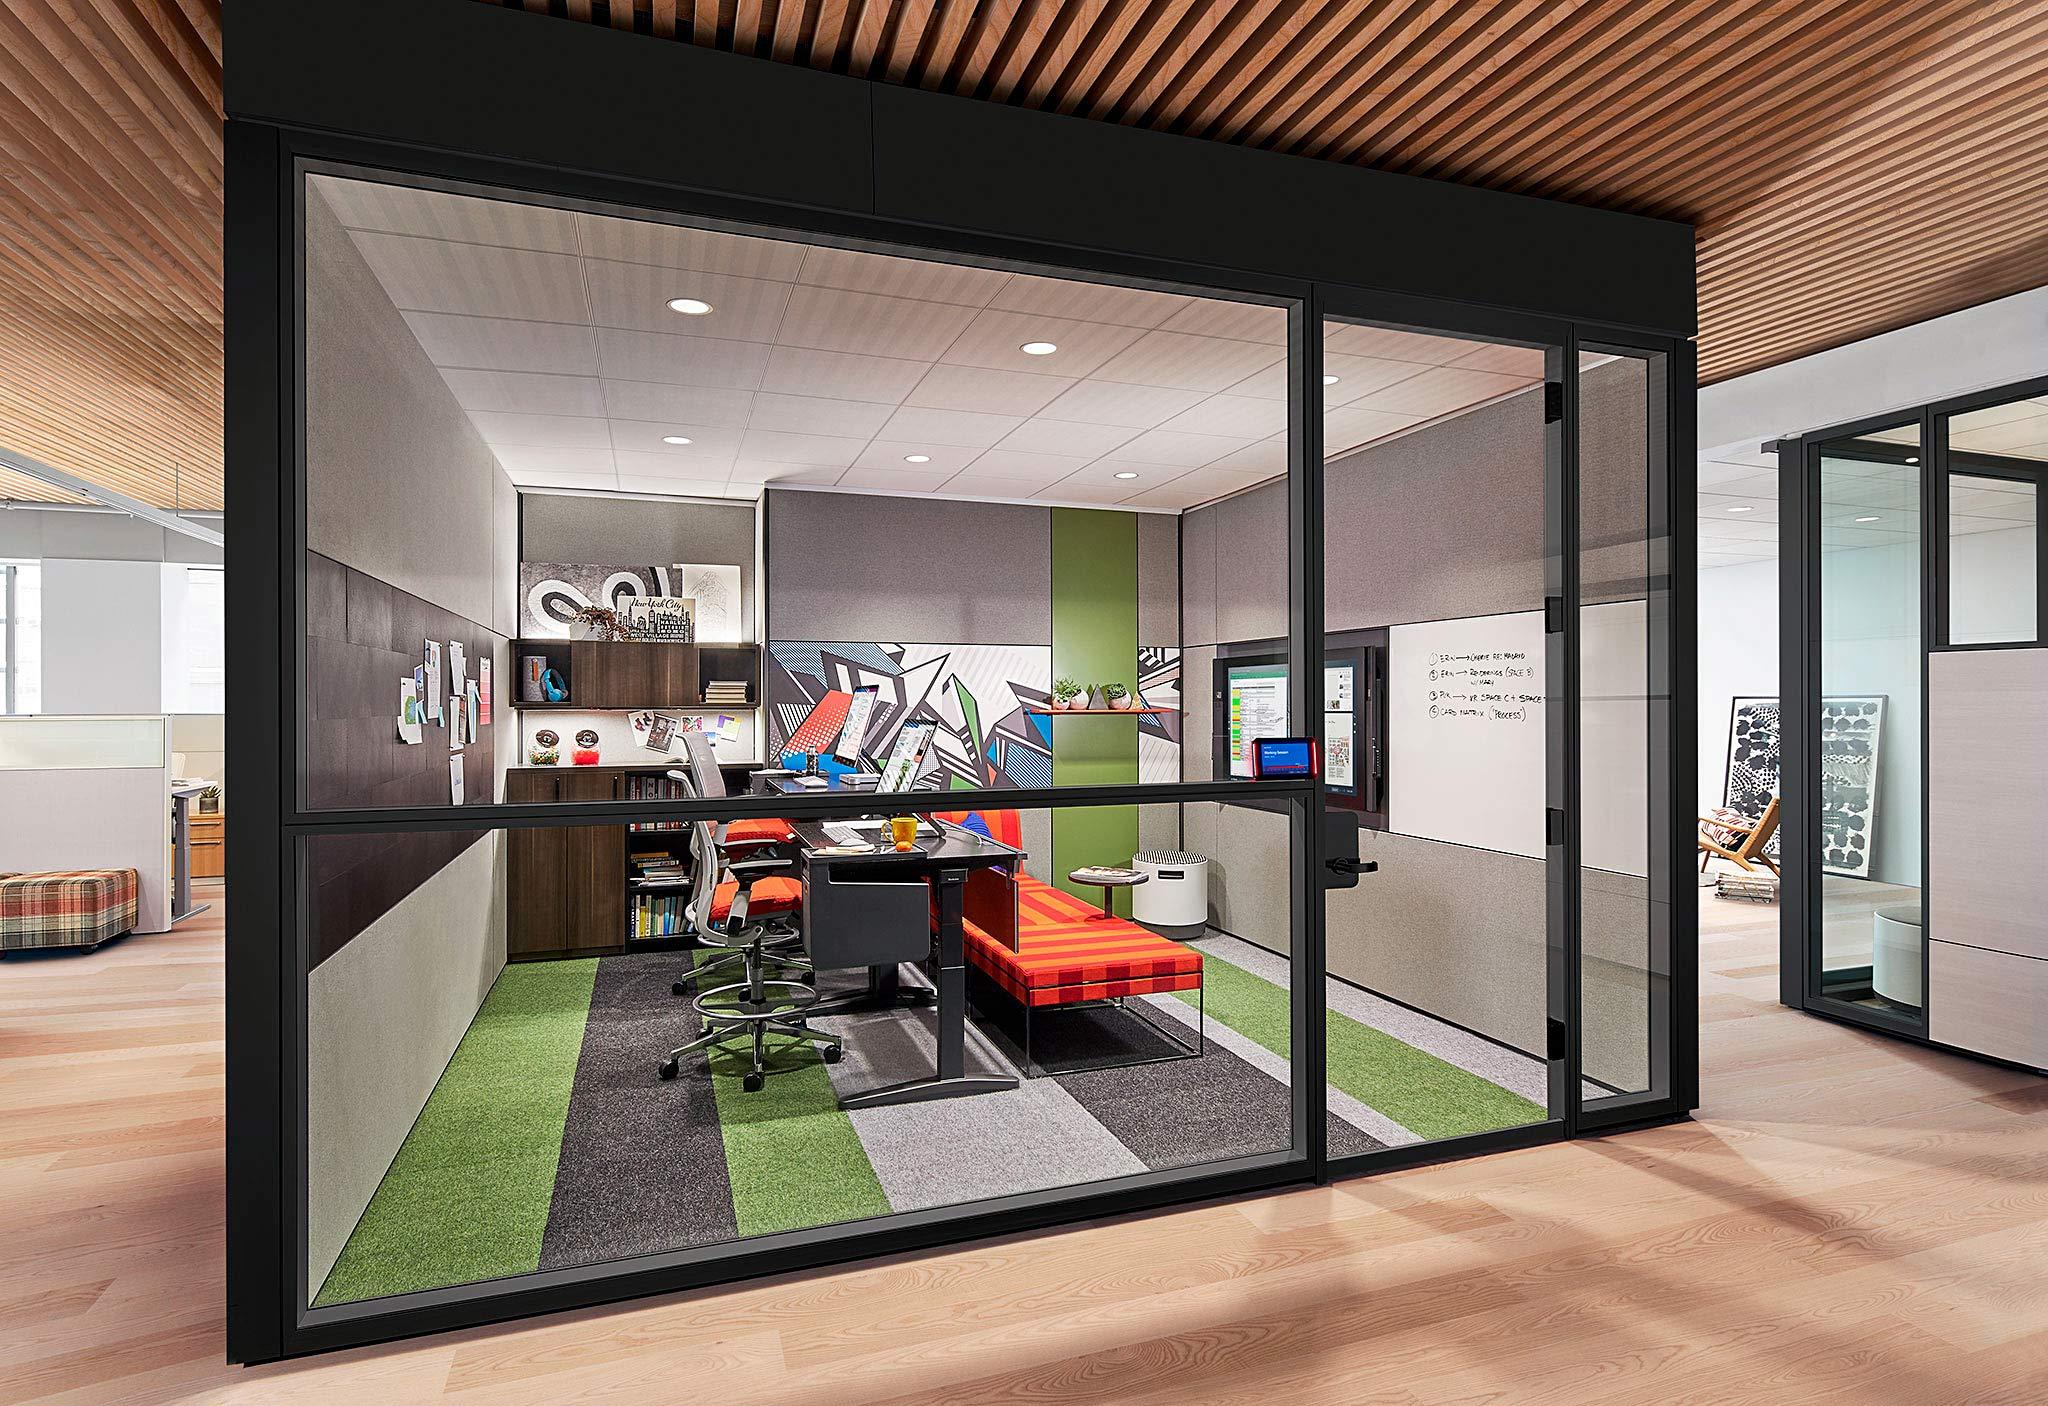 A beautiful Steelcase + Microsoft creative space in New York City.